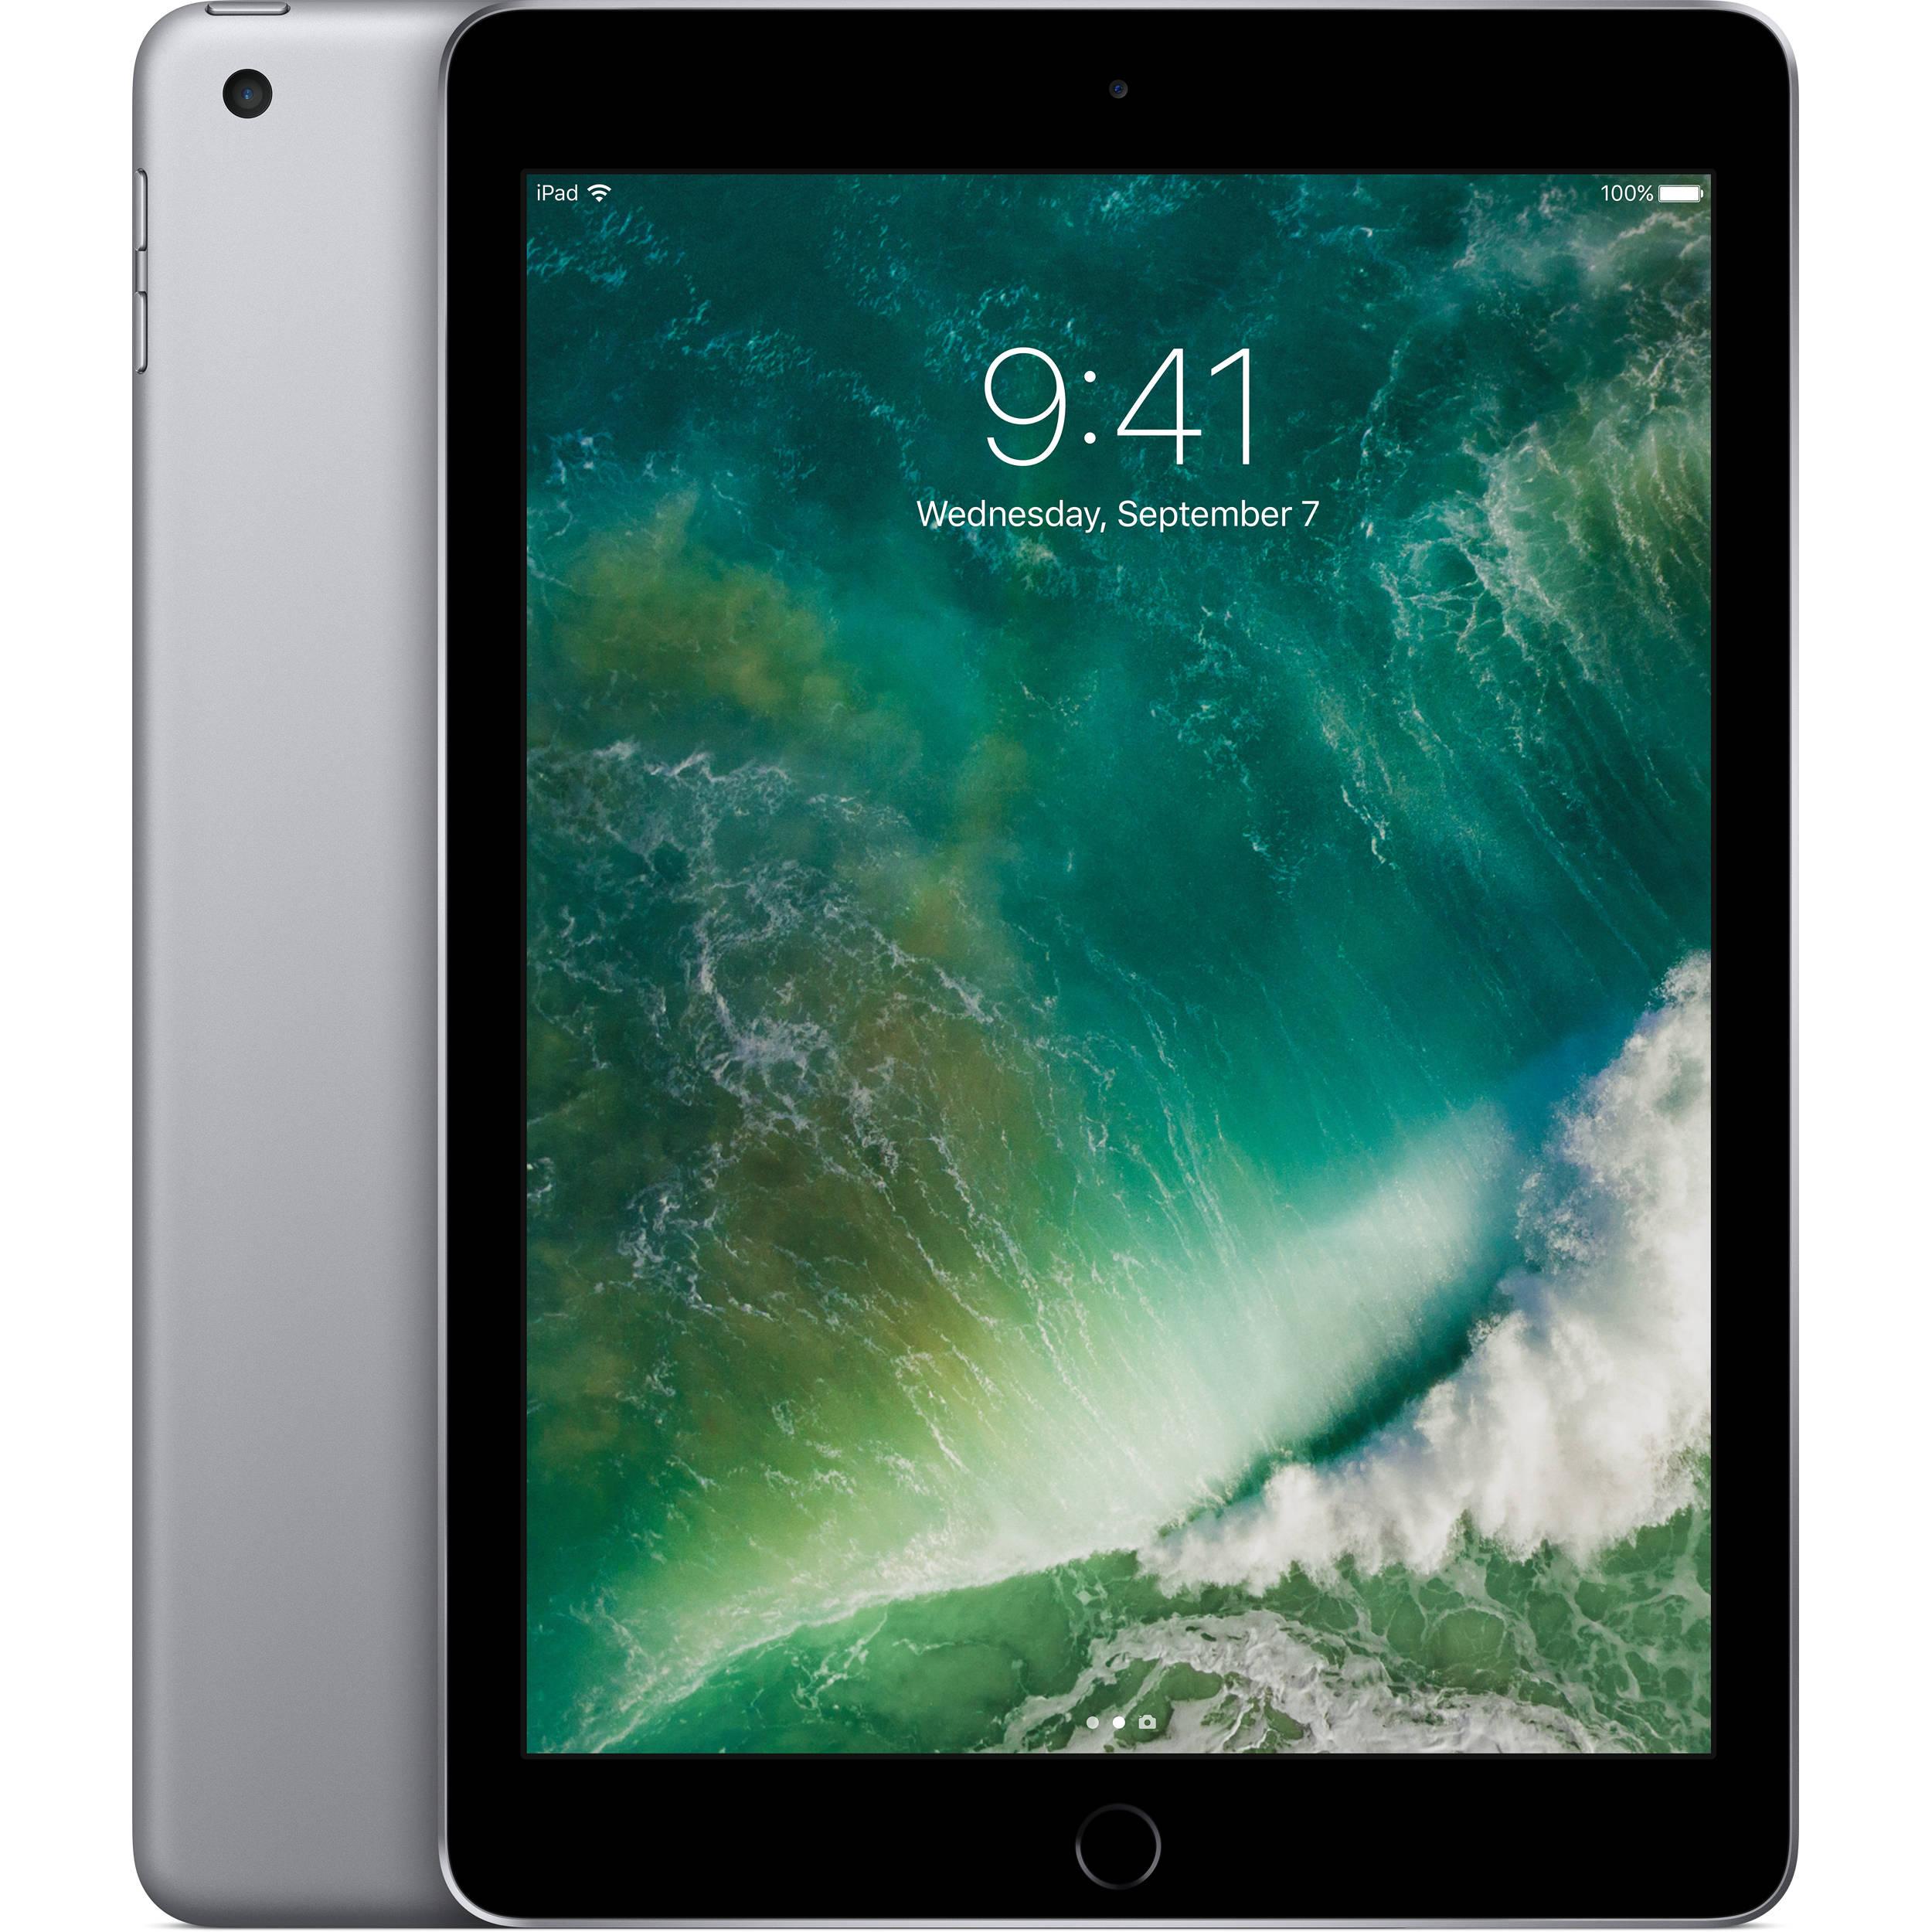 Apple 97 Ipad Mp2f2lla Bh Photo Video